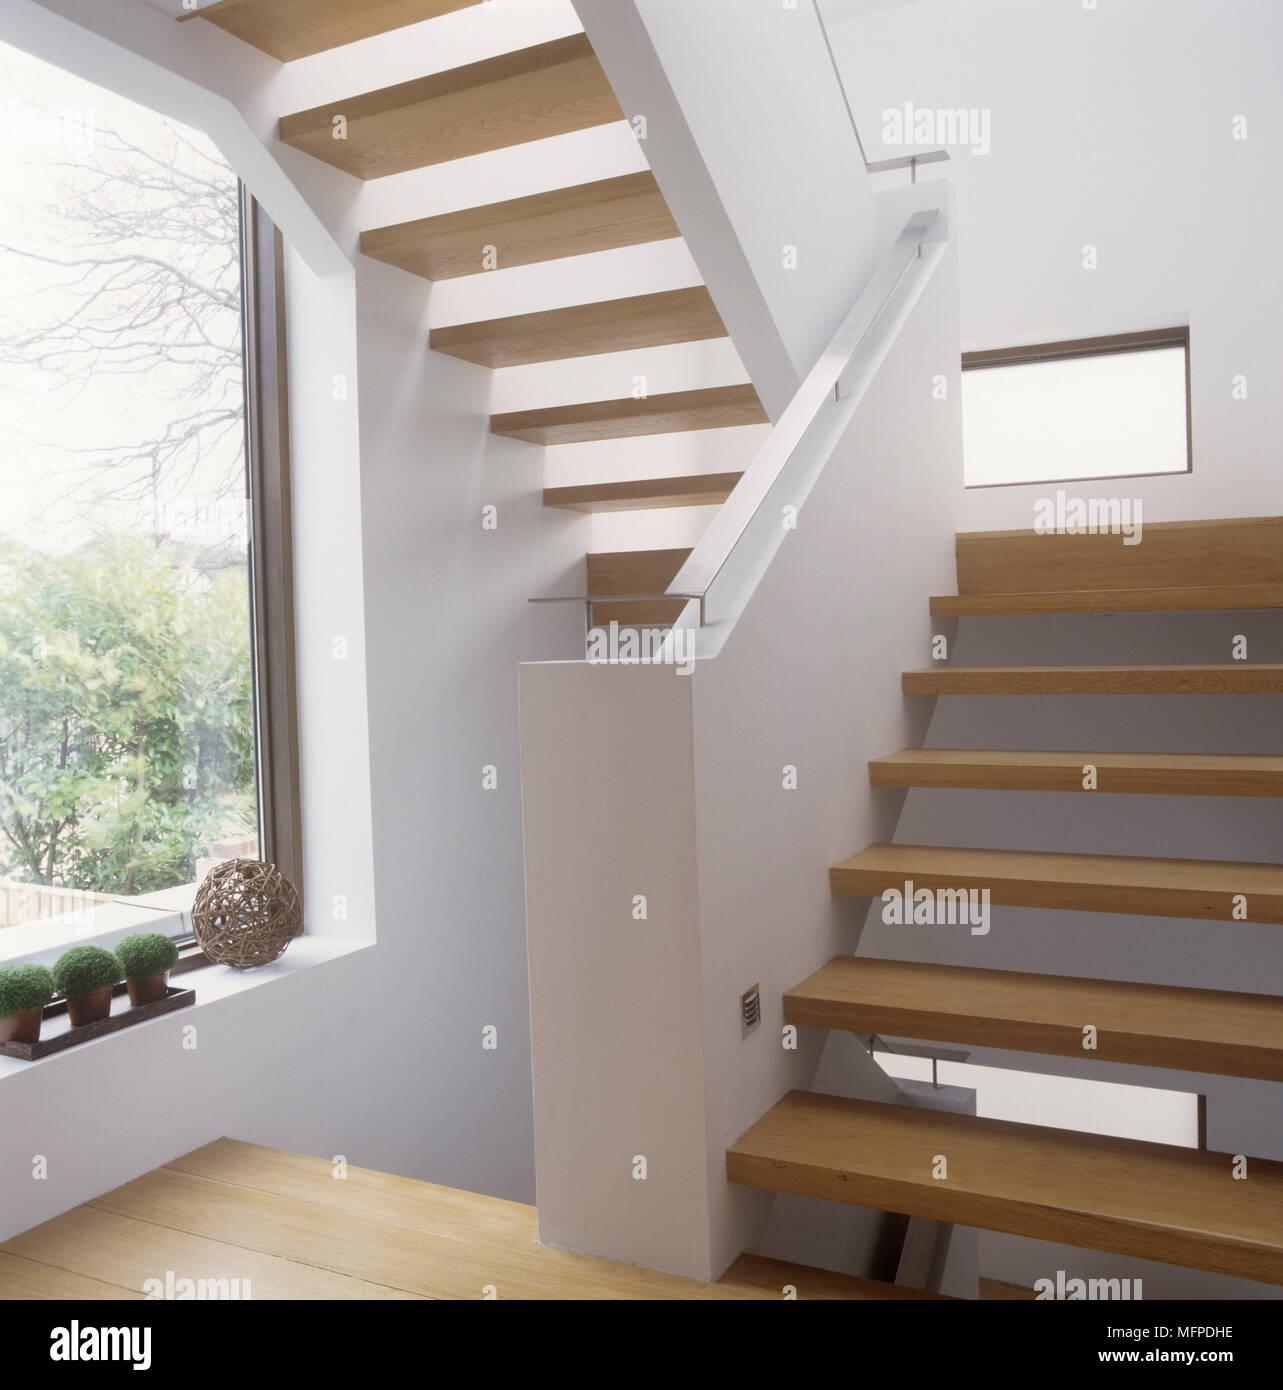 Moderne Holztreppe moderne holztreppe mit geländer aus stahl stockfoto, bild: 181817146